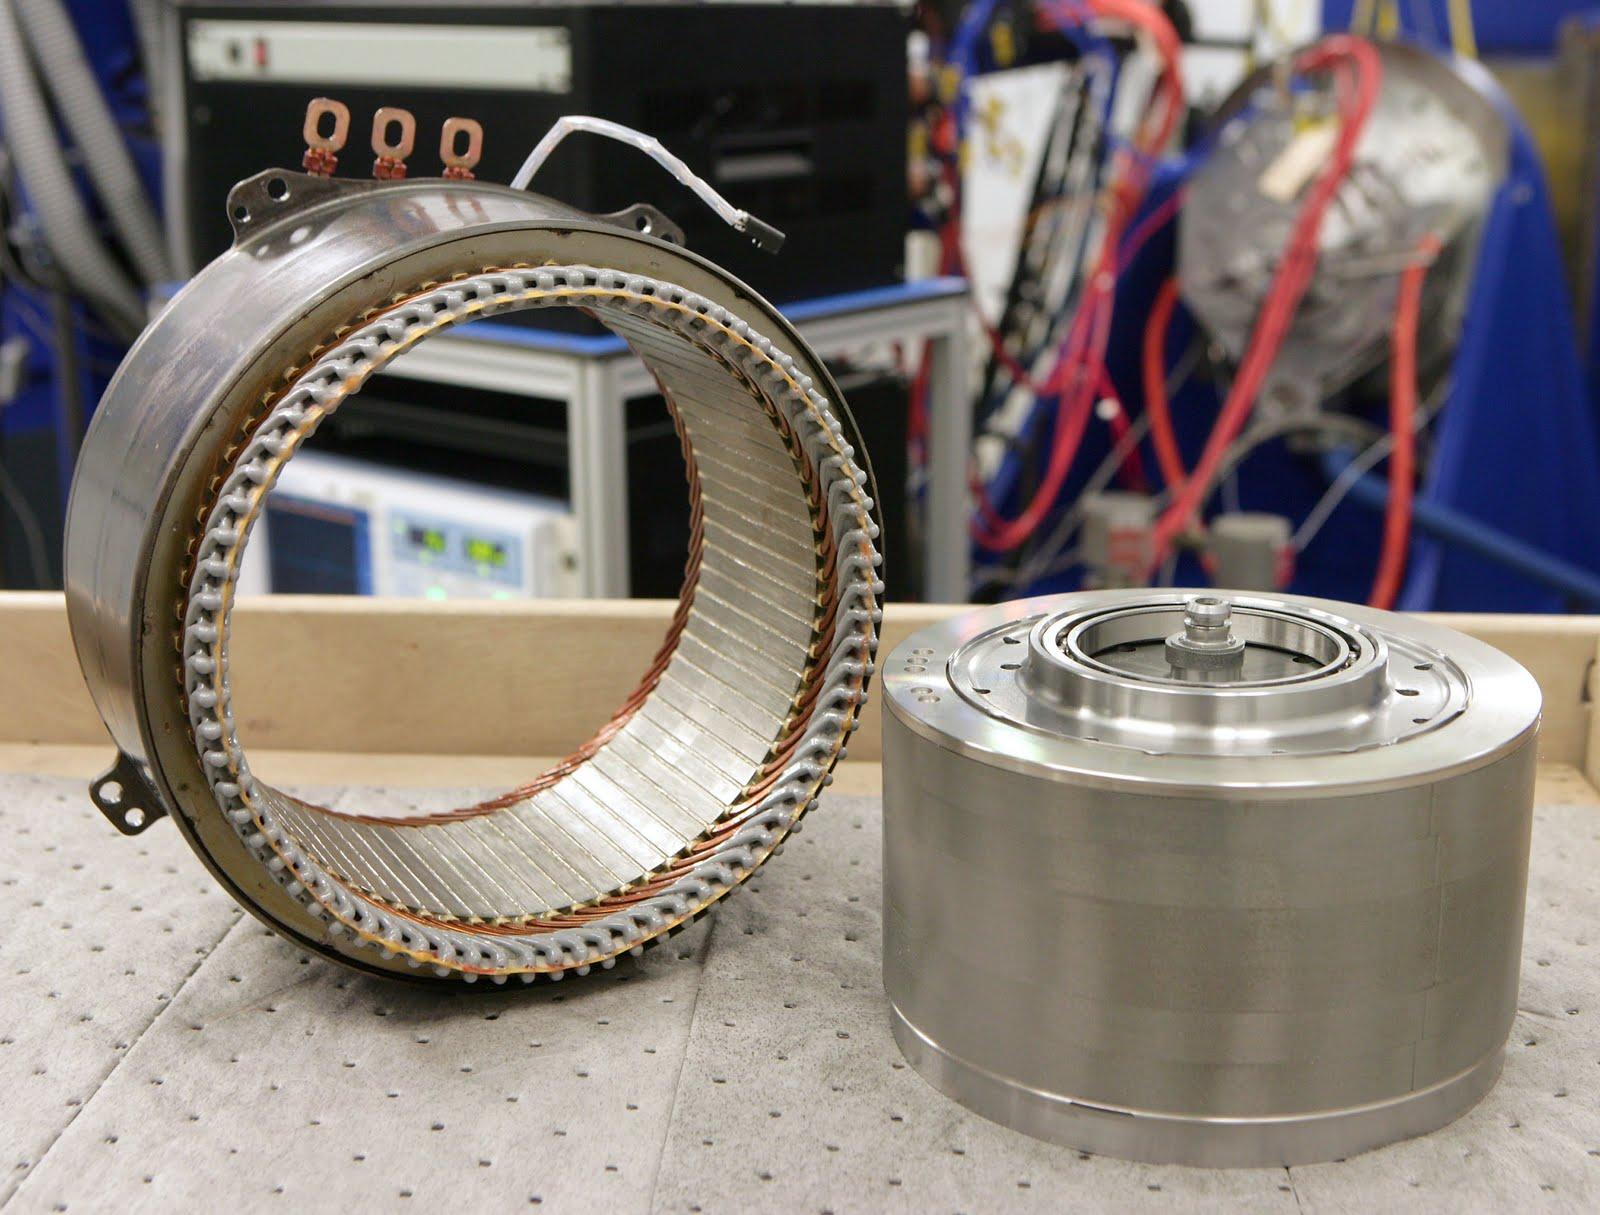 Borgwarner To Buy Electric Motor Maker Remy For 950m